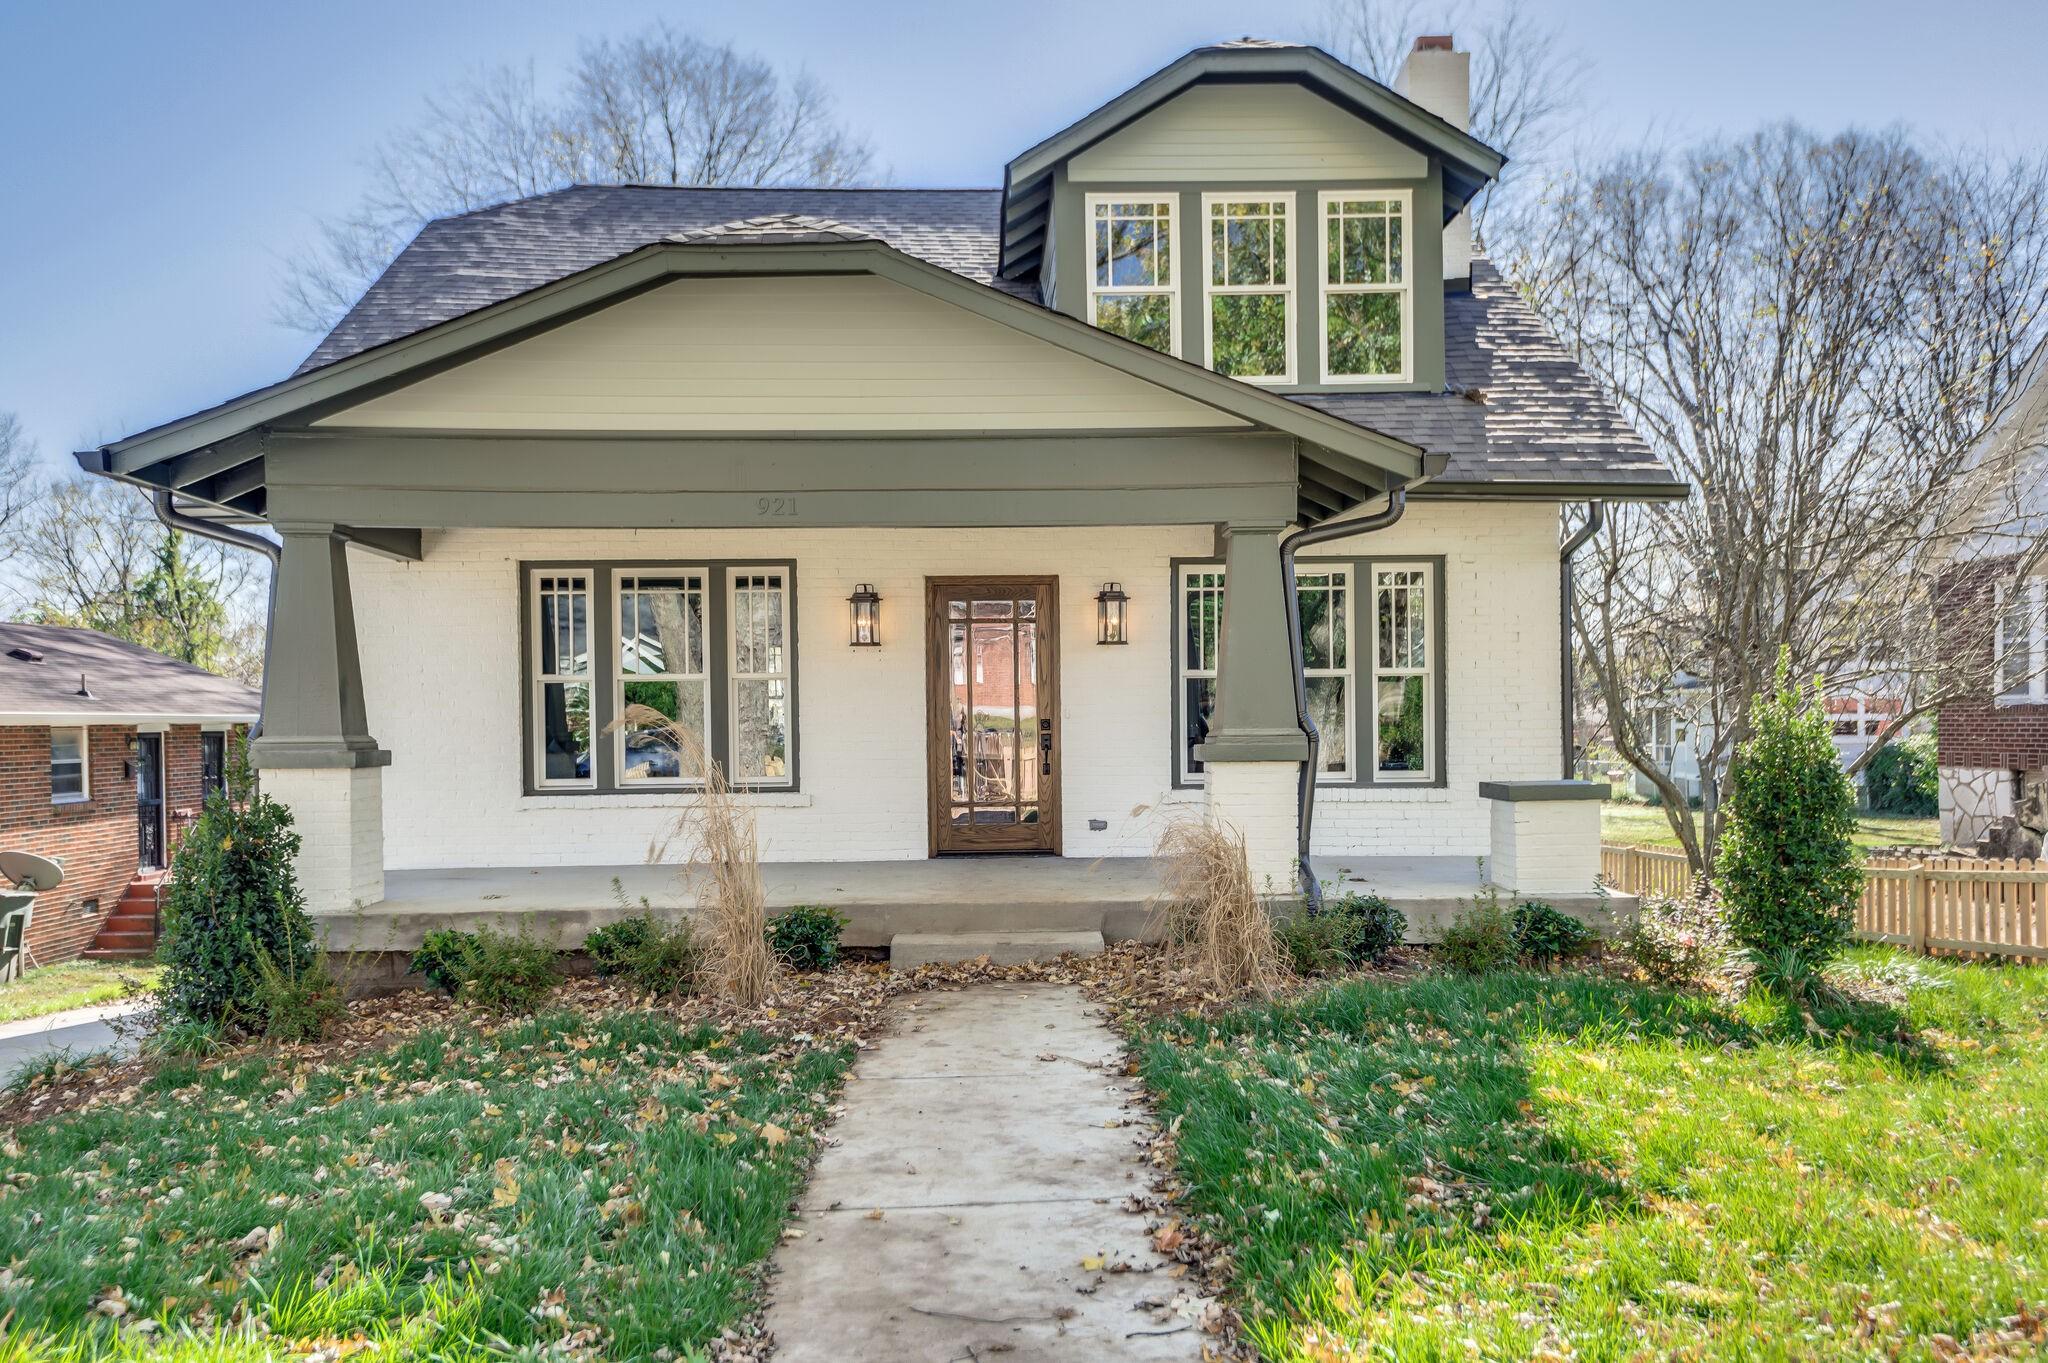 921A Benton Ave Property Photo - Nashville, TN real estate listing